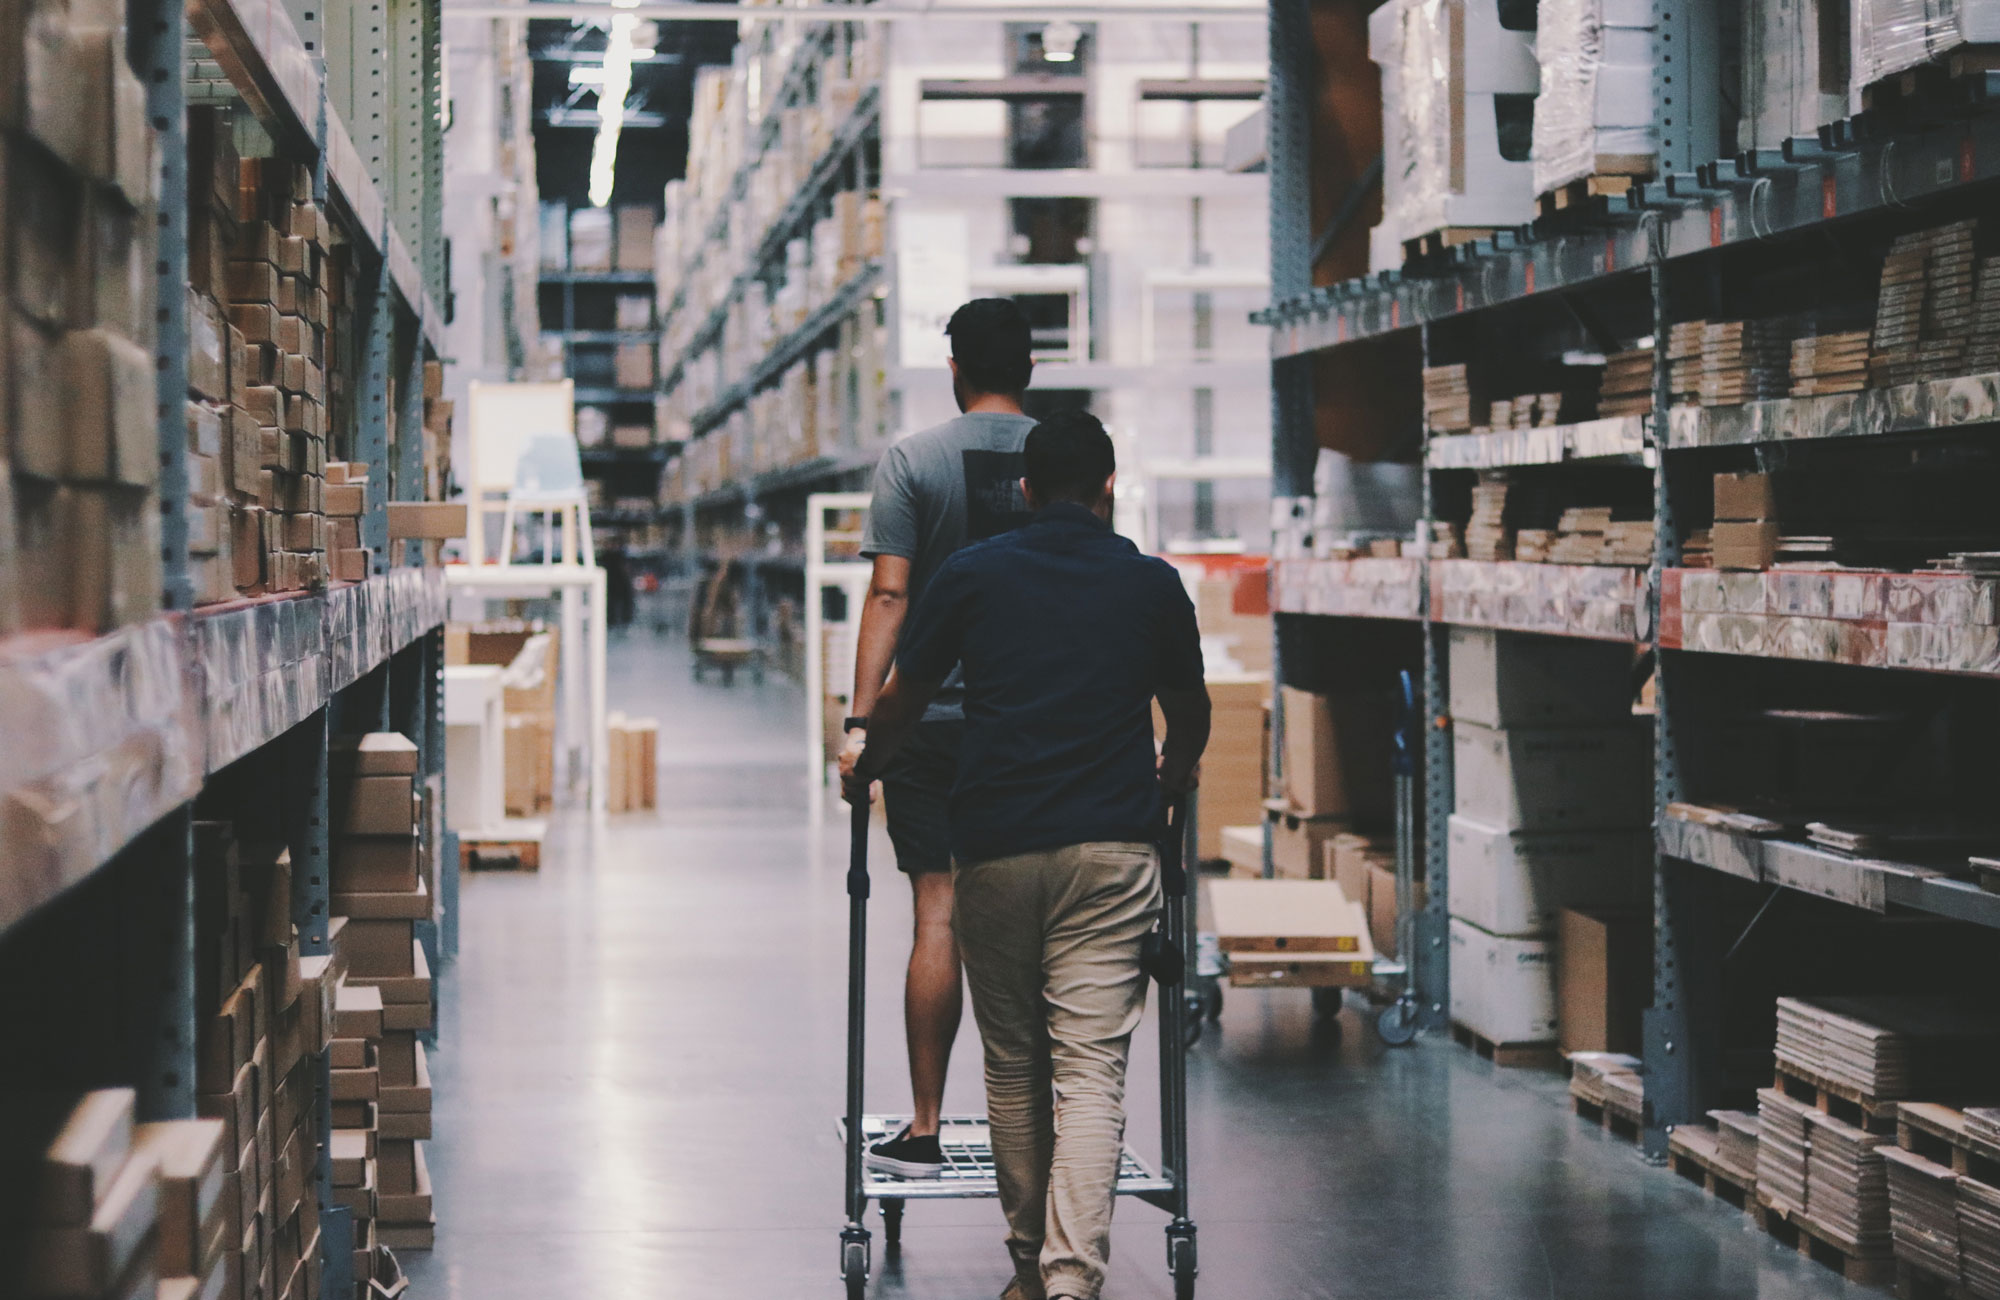 Garde meuble & Stockage - Satta Signes